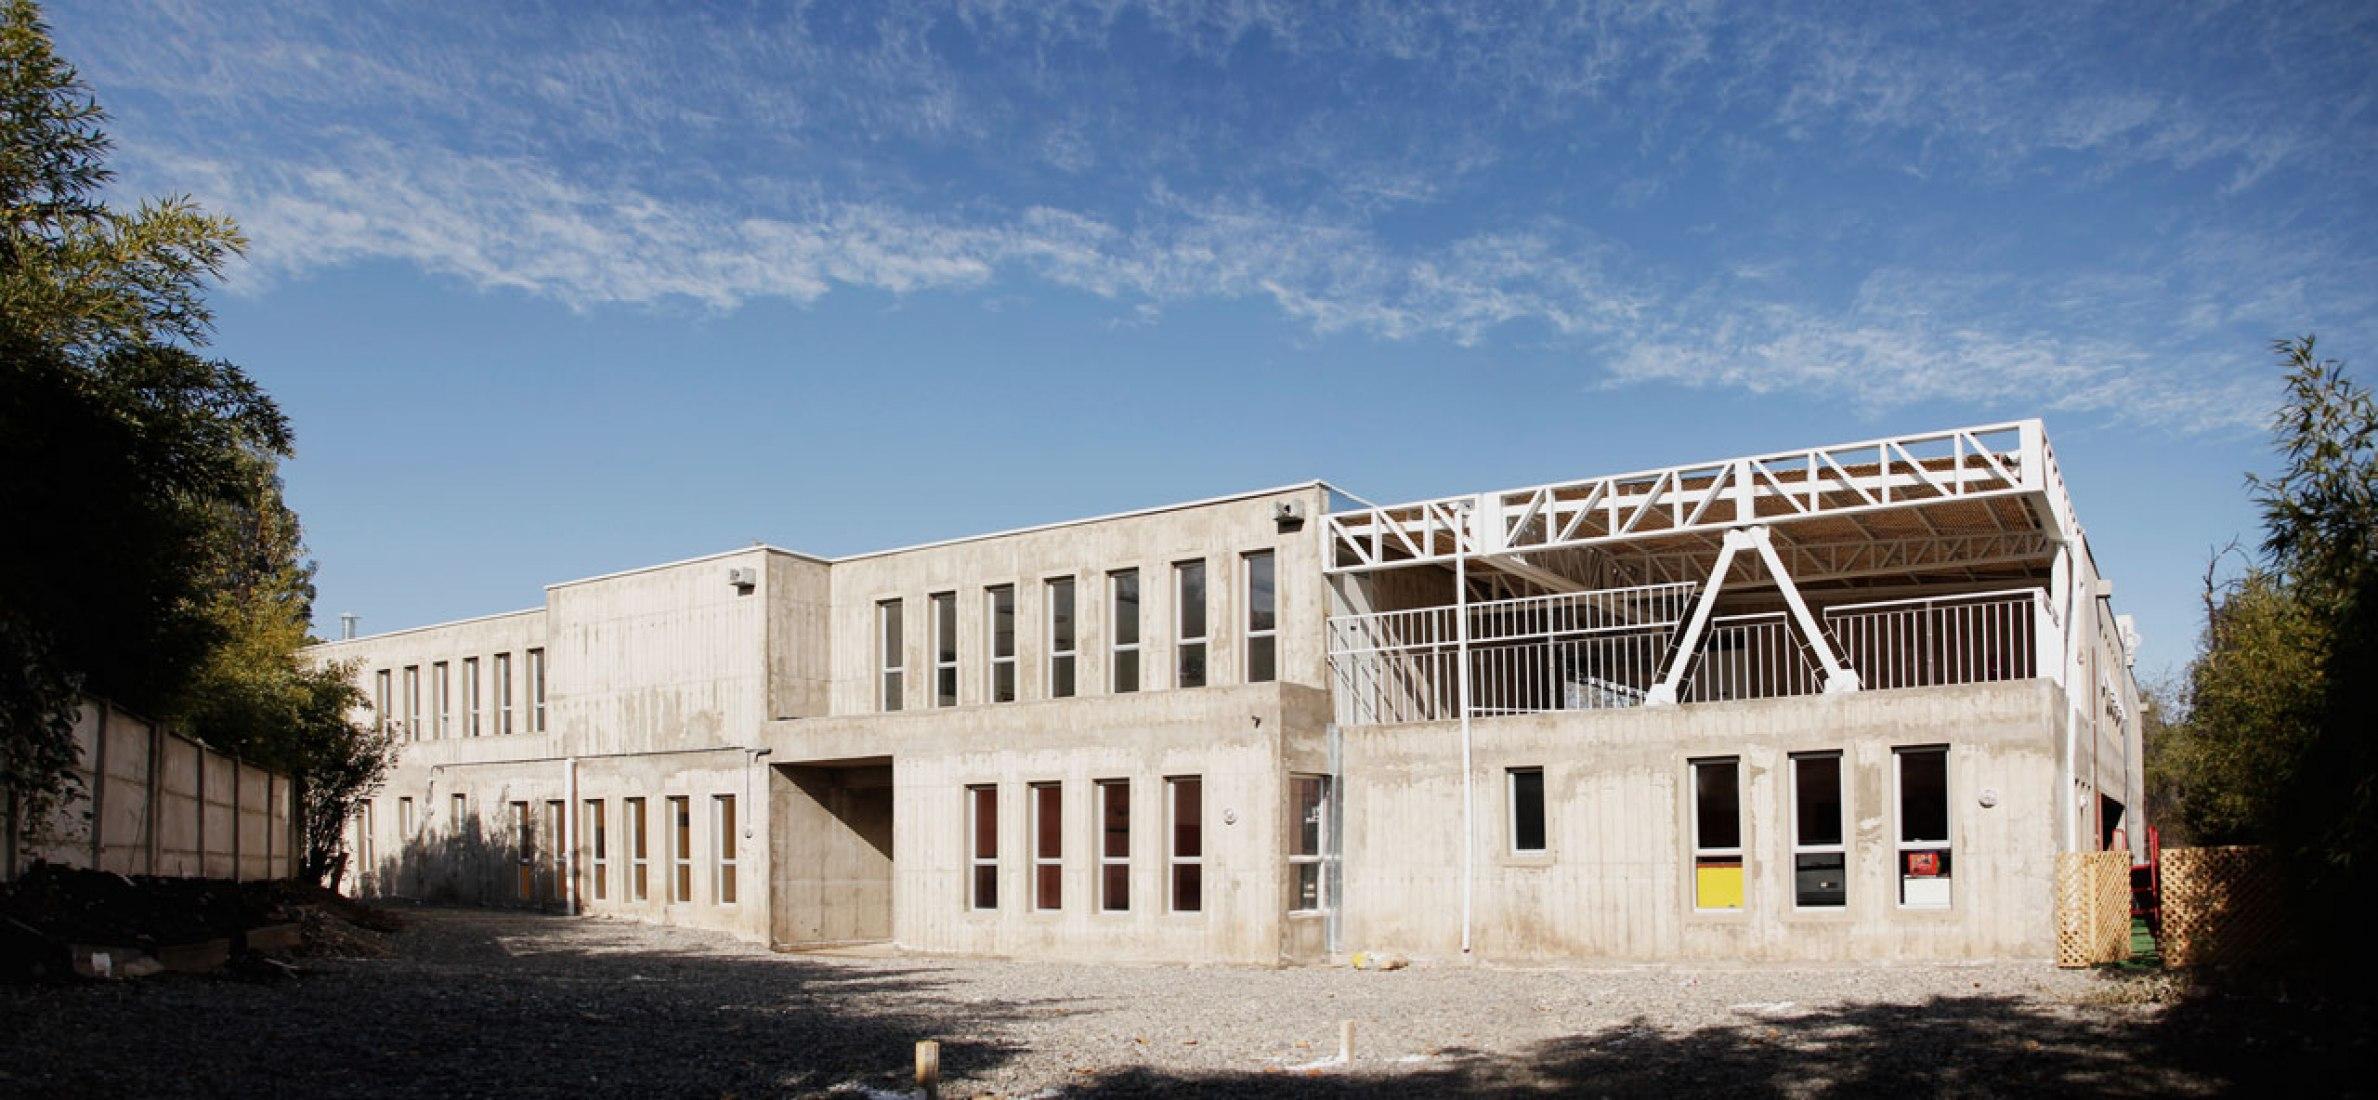 East façade of Lastra Kindergarten by Felipe Balmaceda. Photography © Francisca Tuca.